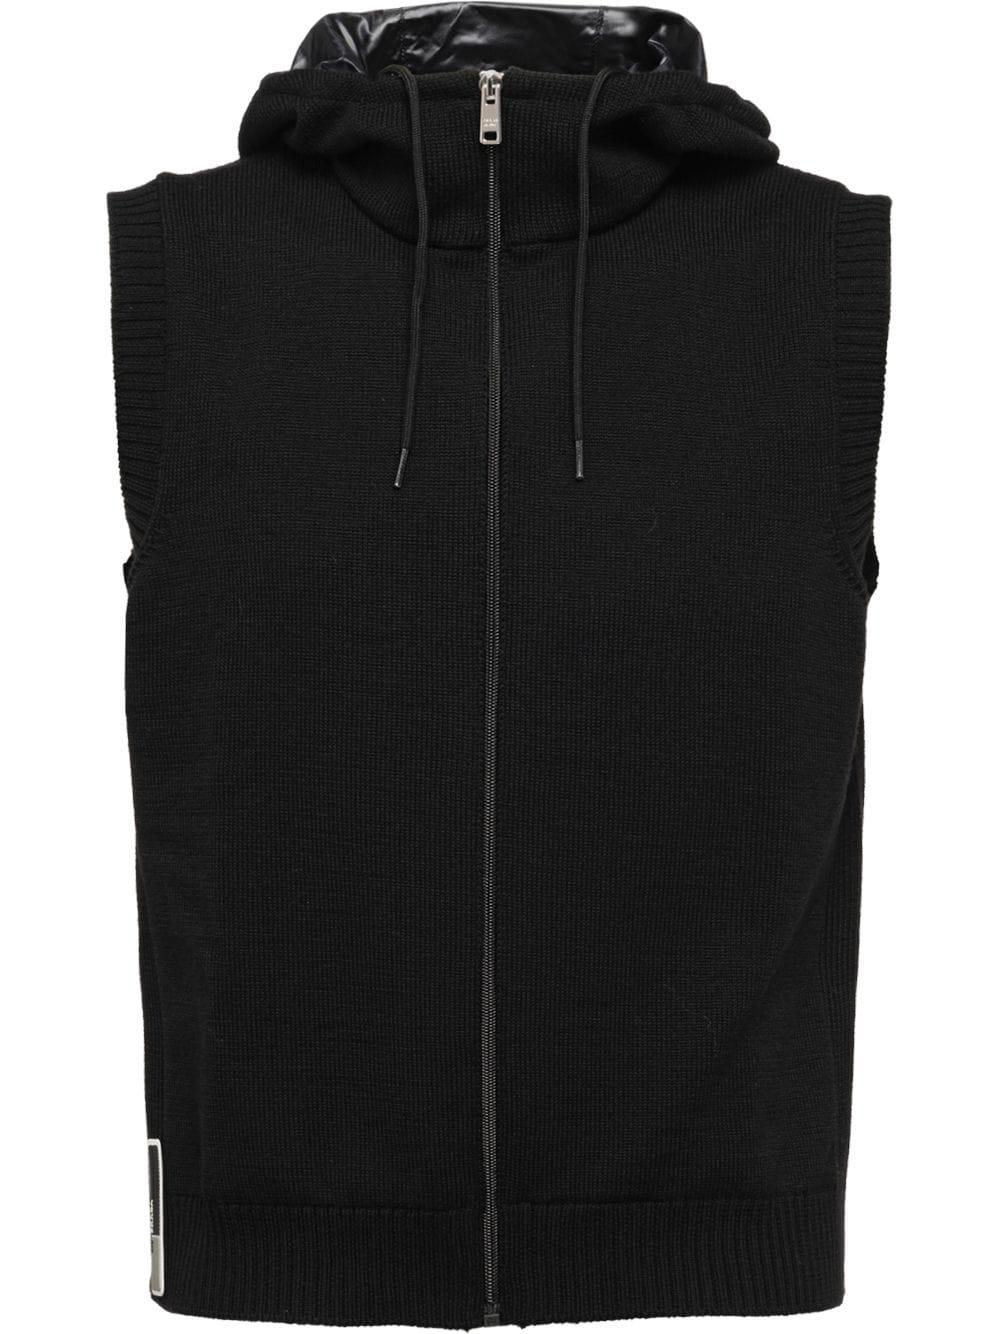 adaa75d077 Prada Wool And Nylon Vest - Black